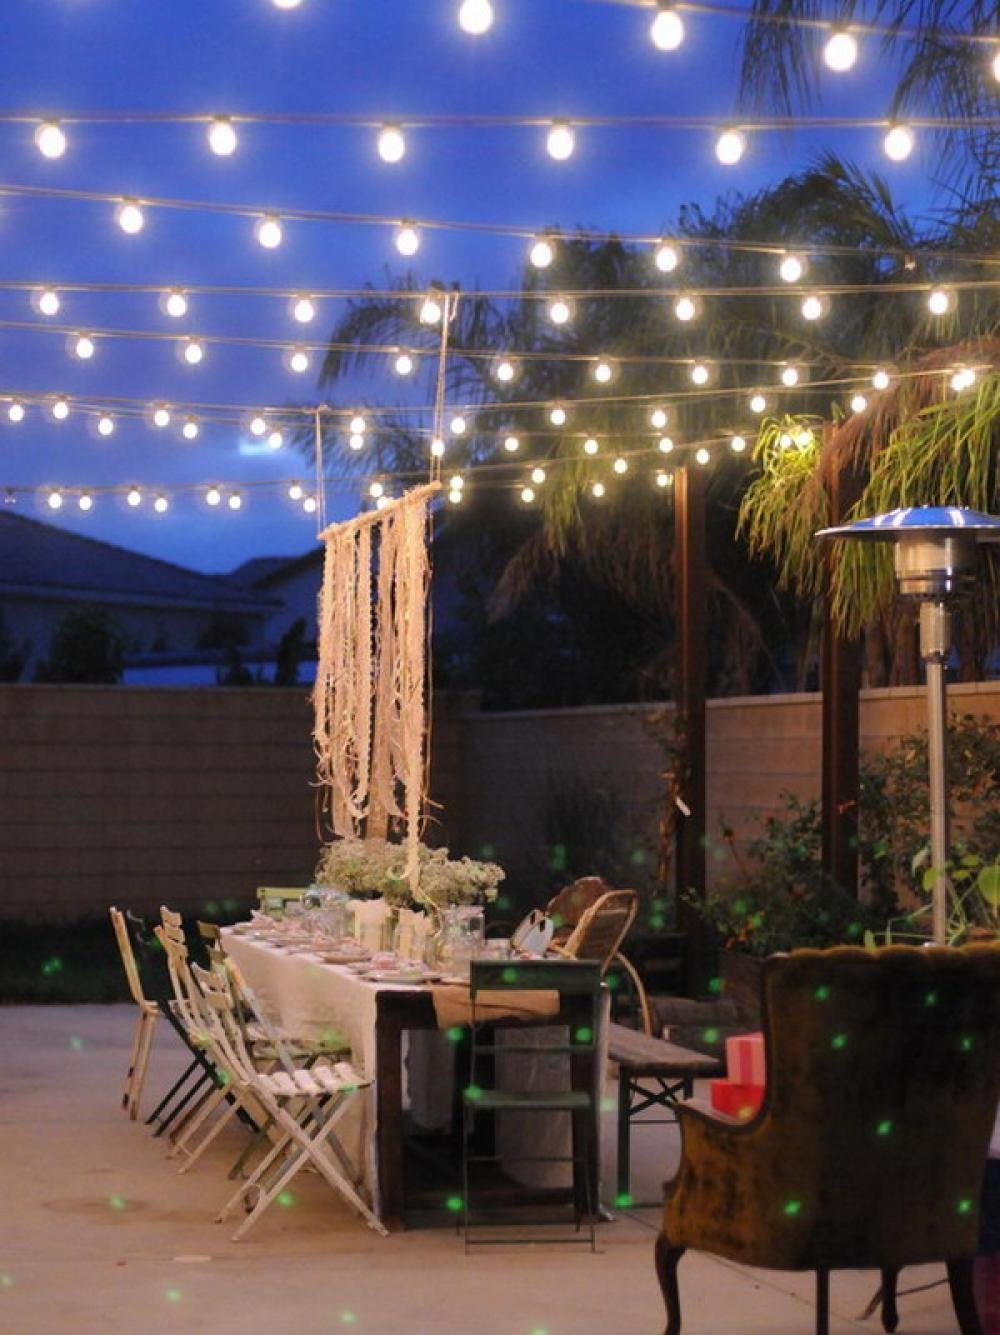 Ordinaire Marvelous Patio Lighting String Patio String Lights Outdoor Patio Lamp  Ideas Jpg 1000x1335 Outdoor Patio Lighting